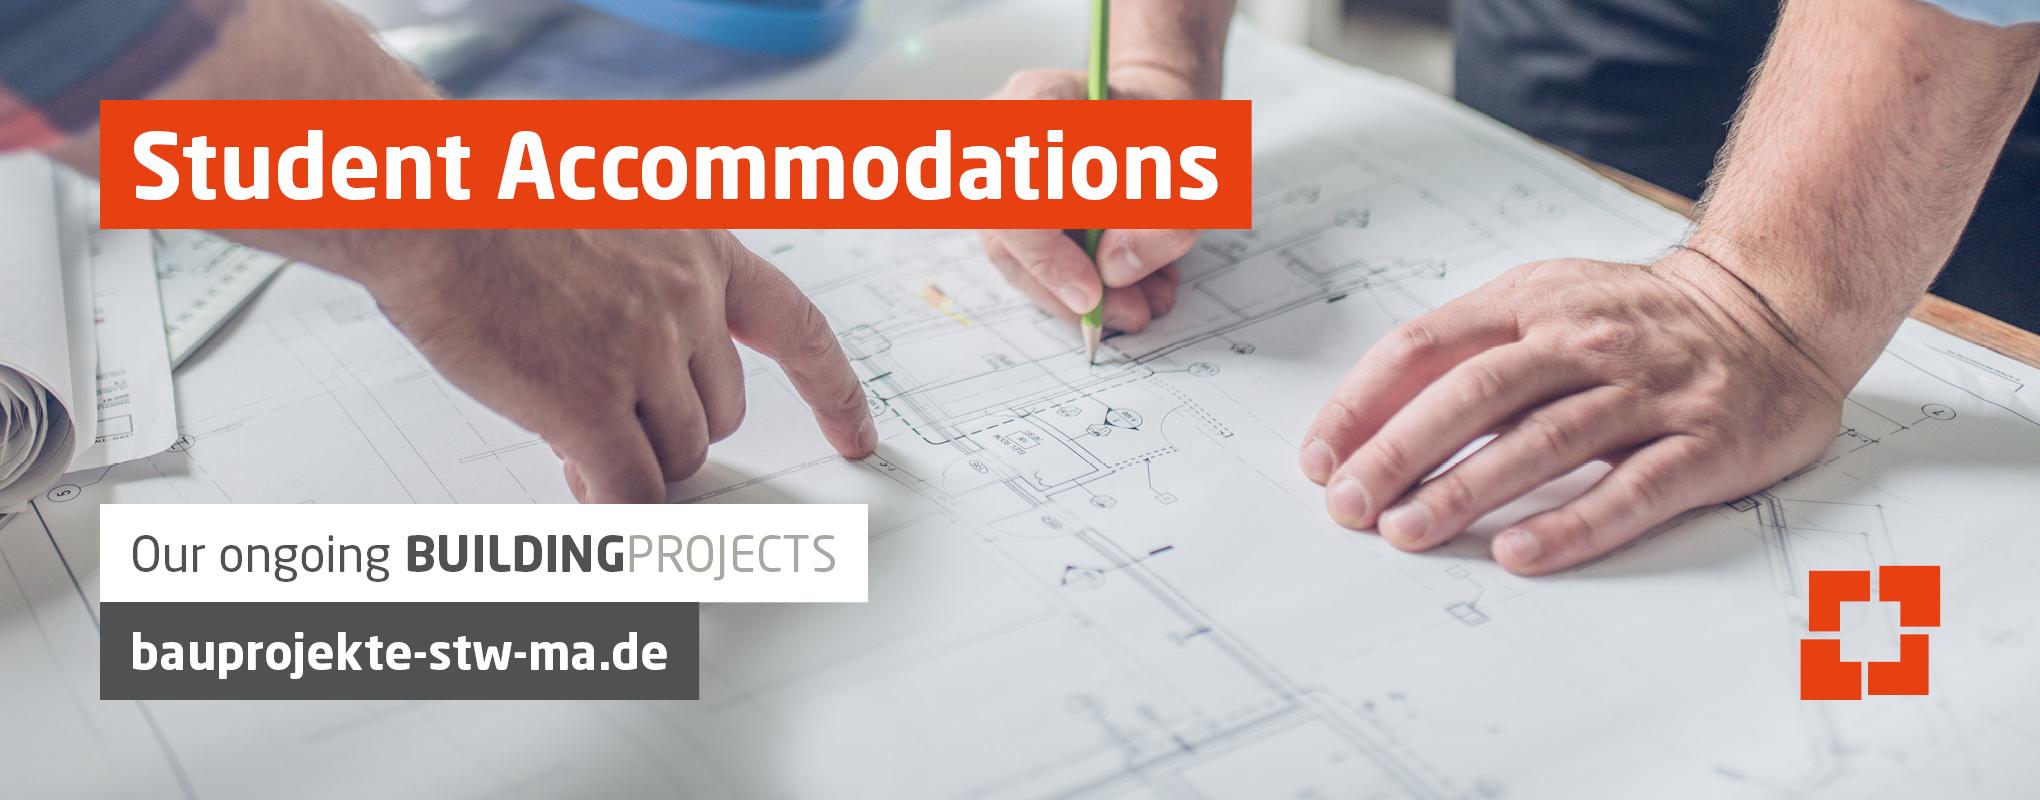 BuildingProjects